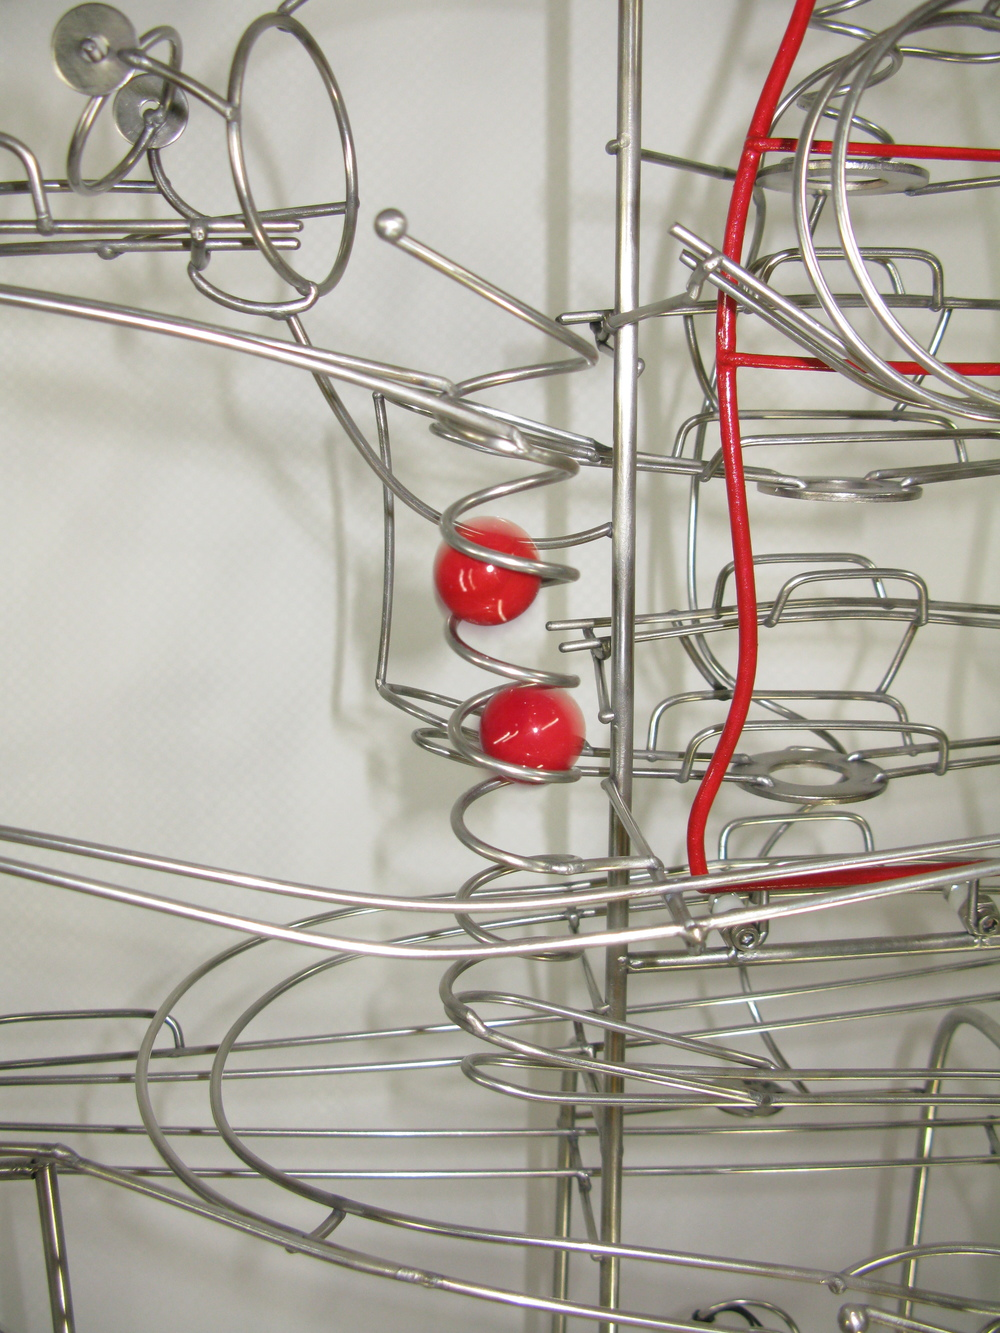 Kugelbahn-Marble-Art-Sculpture-Stephen-Jendro-049.JPG